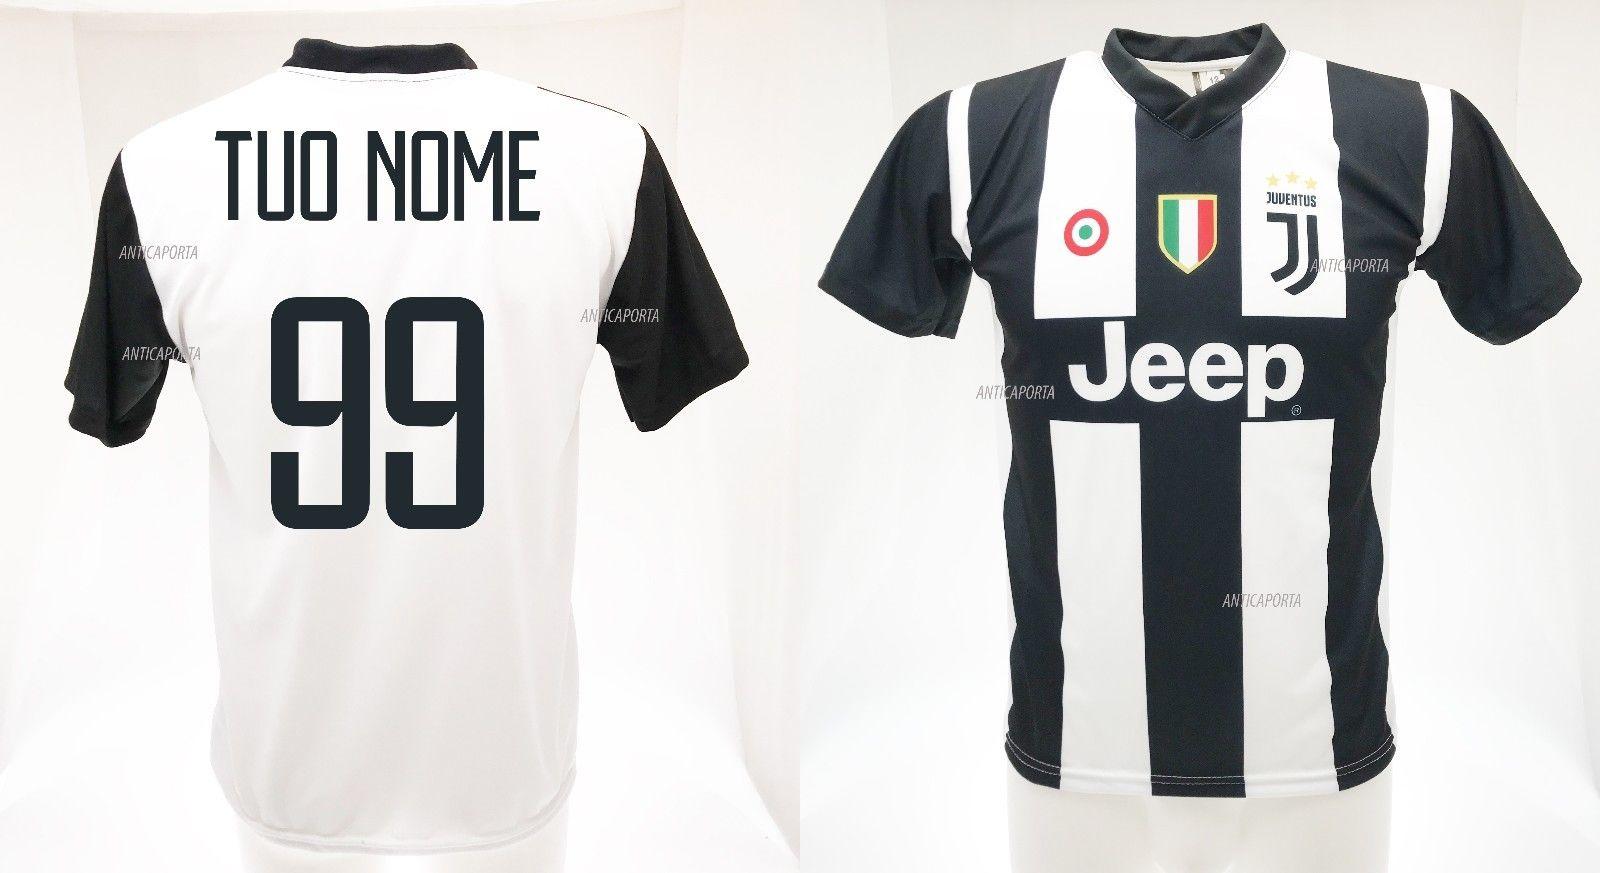 Maglia Juventus su eBay